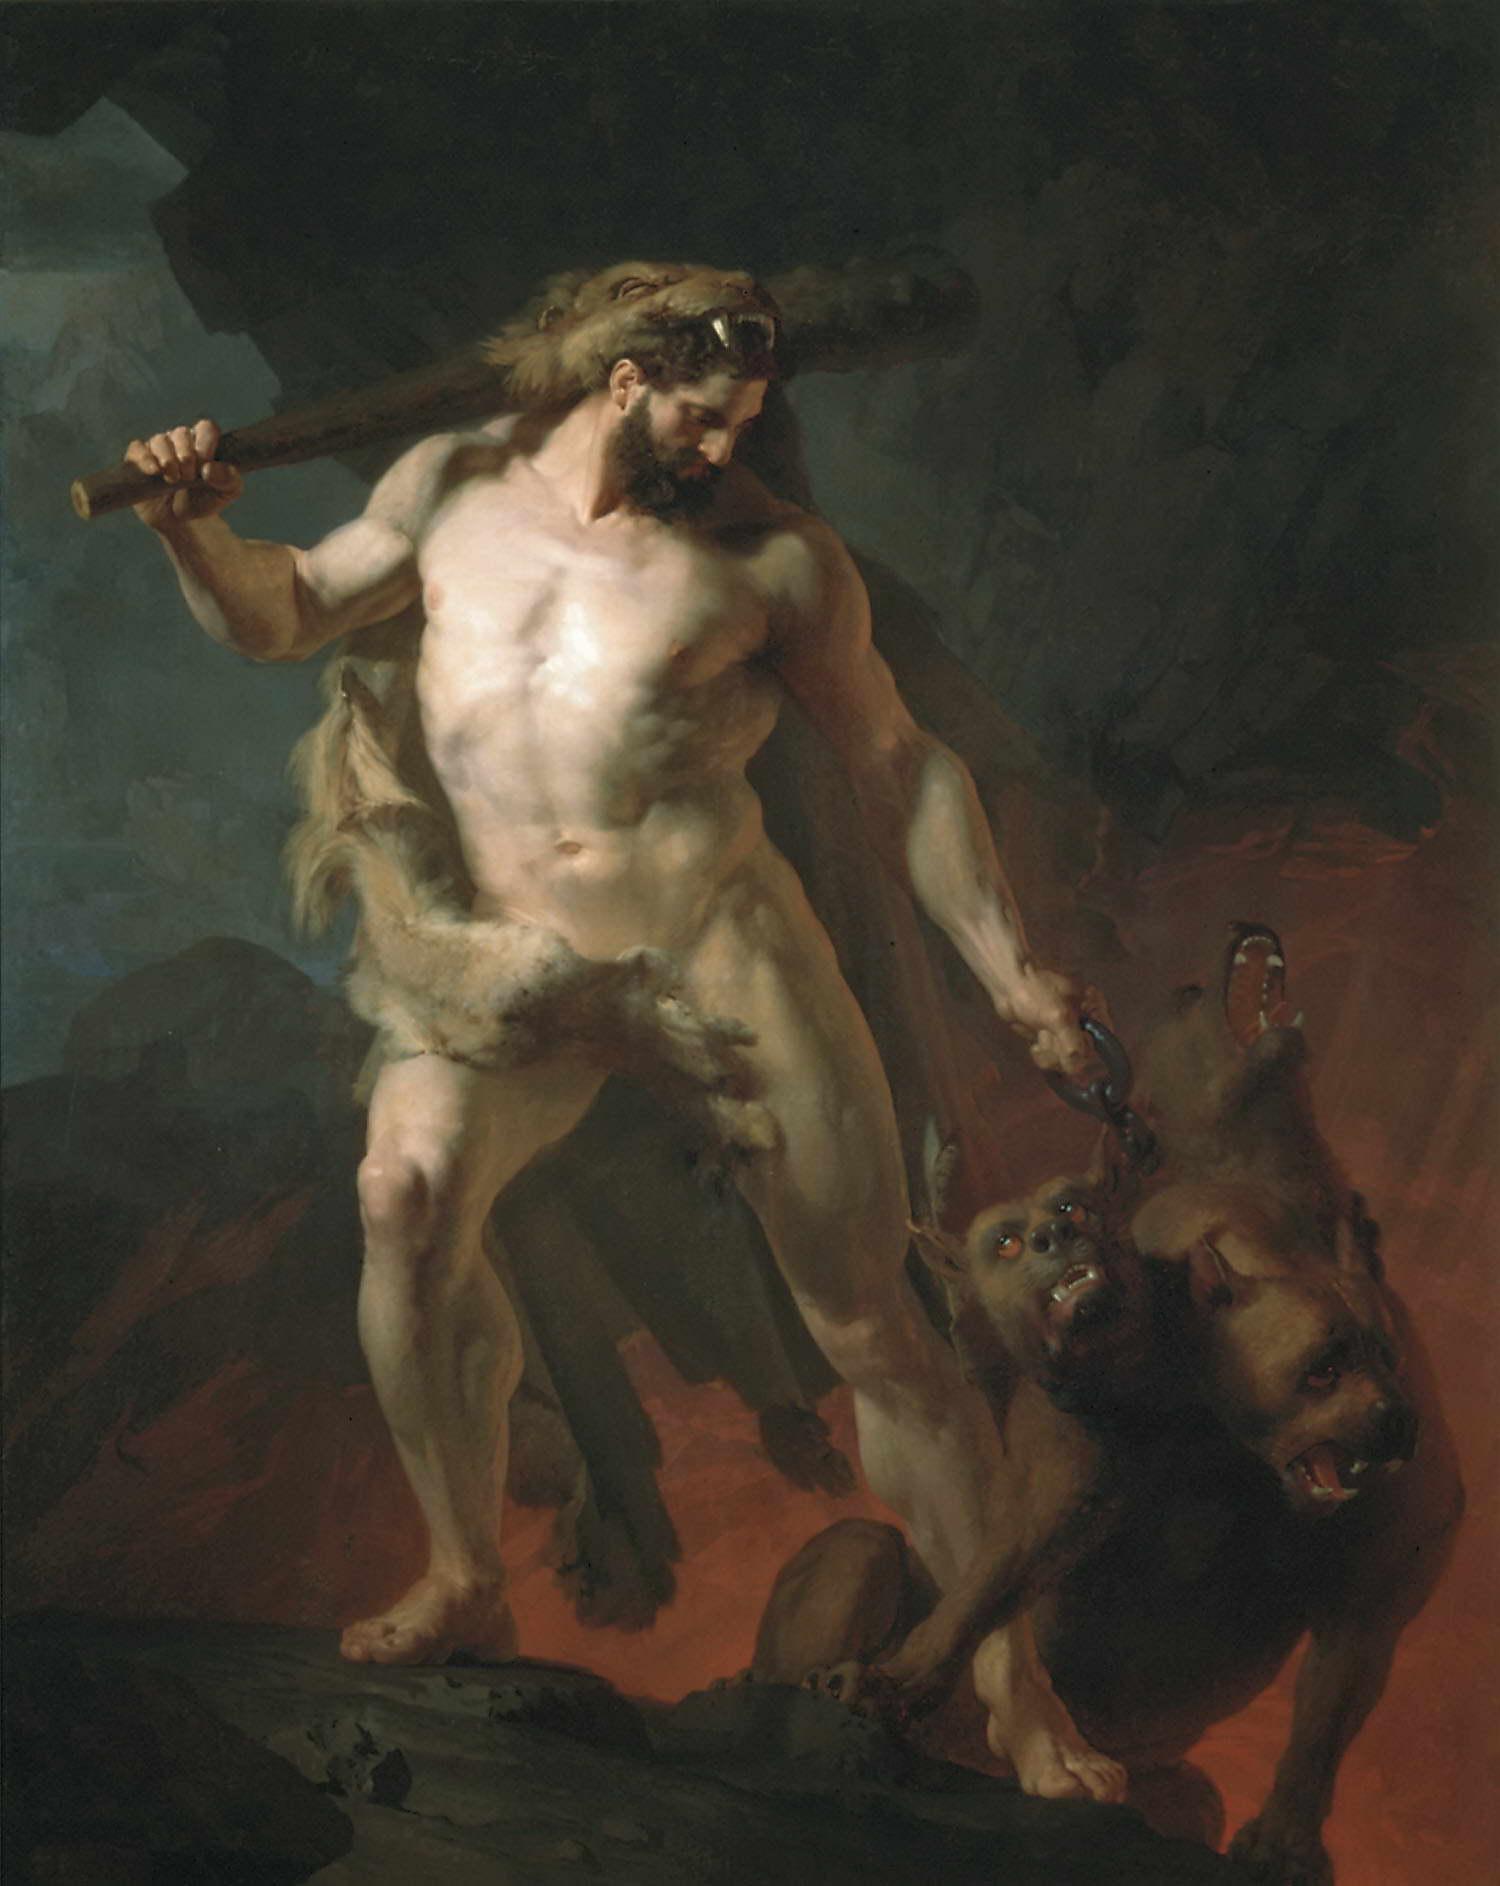 Геркулес выводит Цербера из преисподней — Келер-Вилианди Иван Петрович